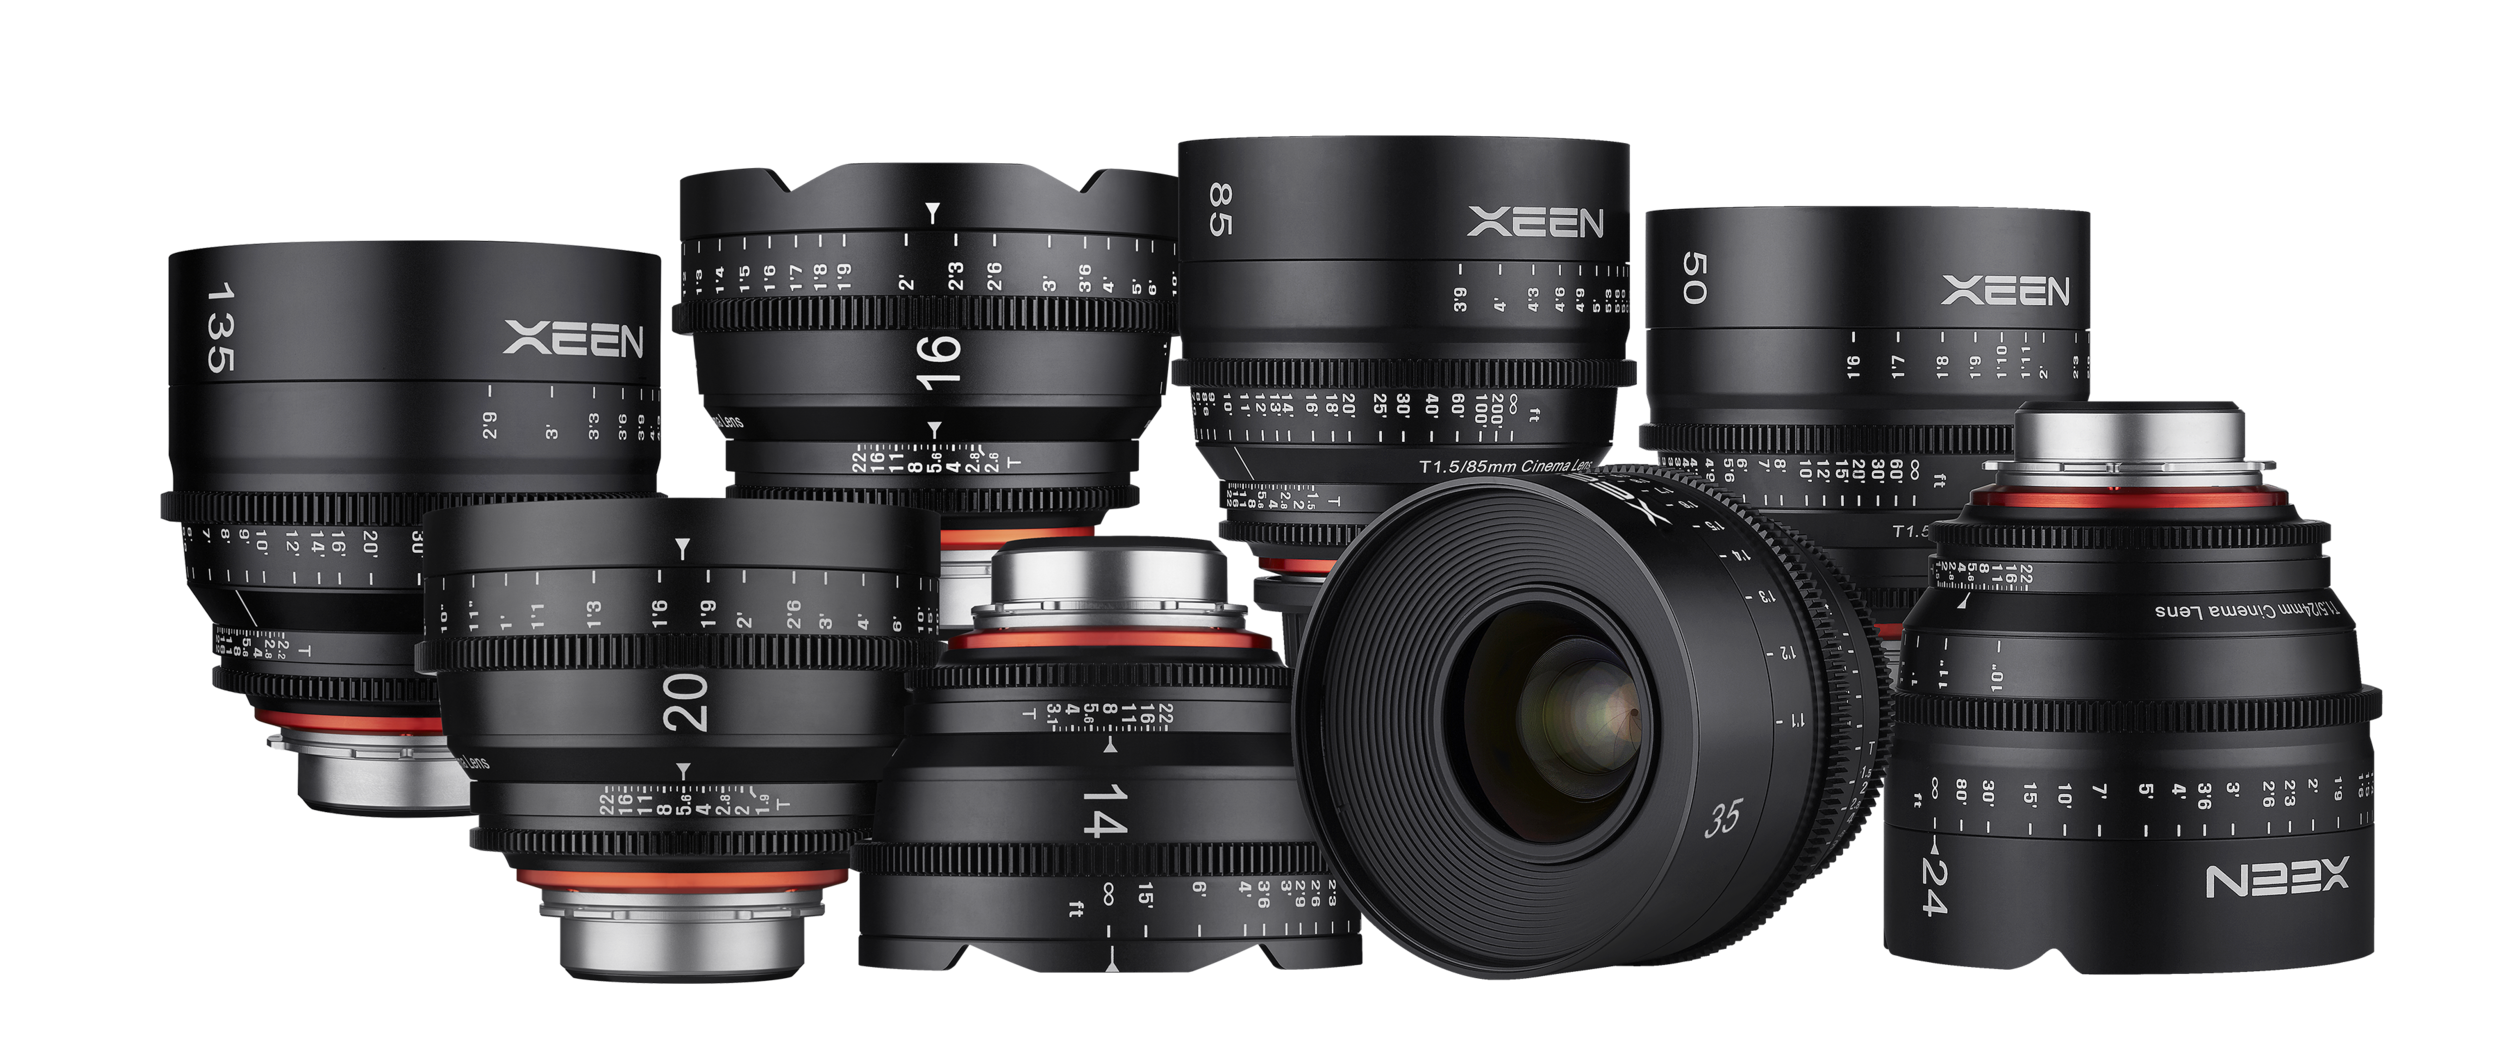 Xeen by Rokinon Professional Cinema Lenses